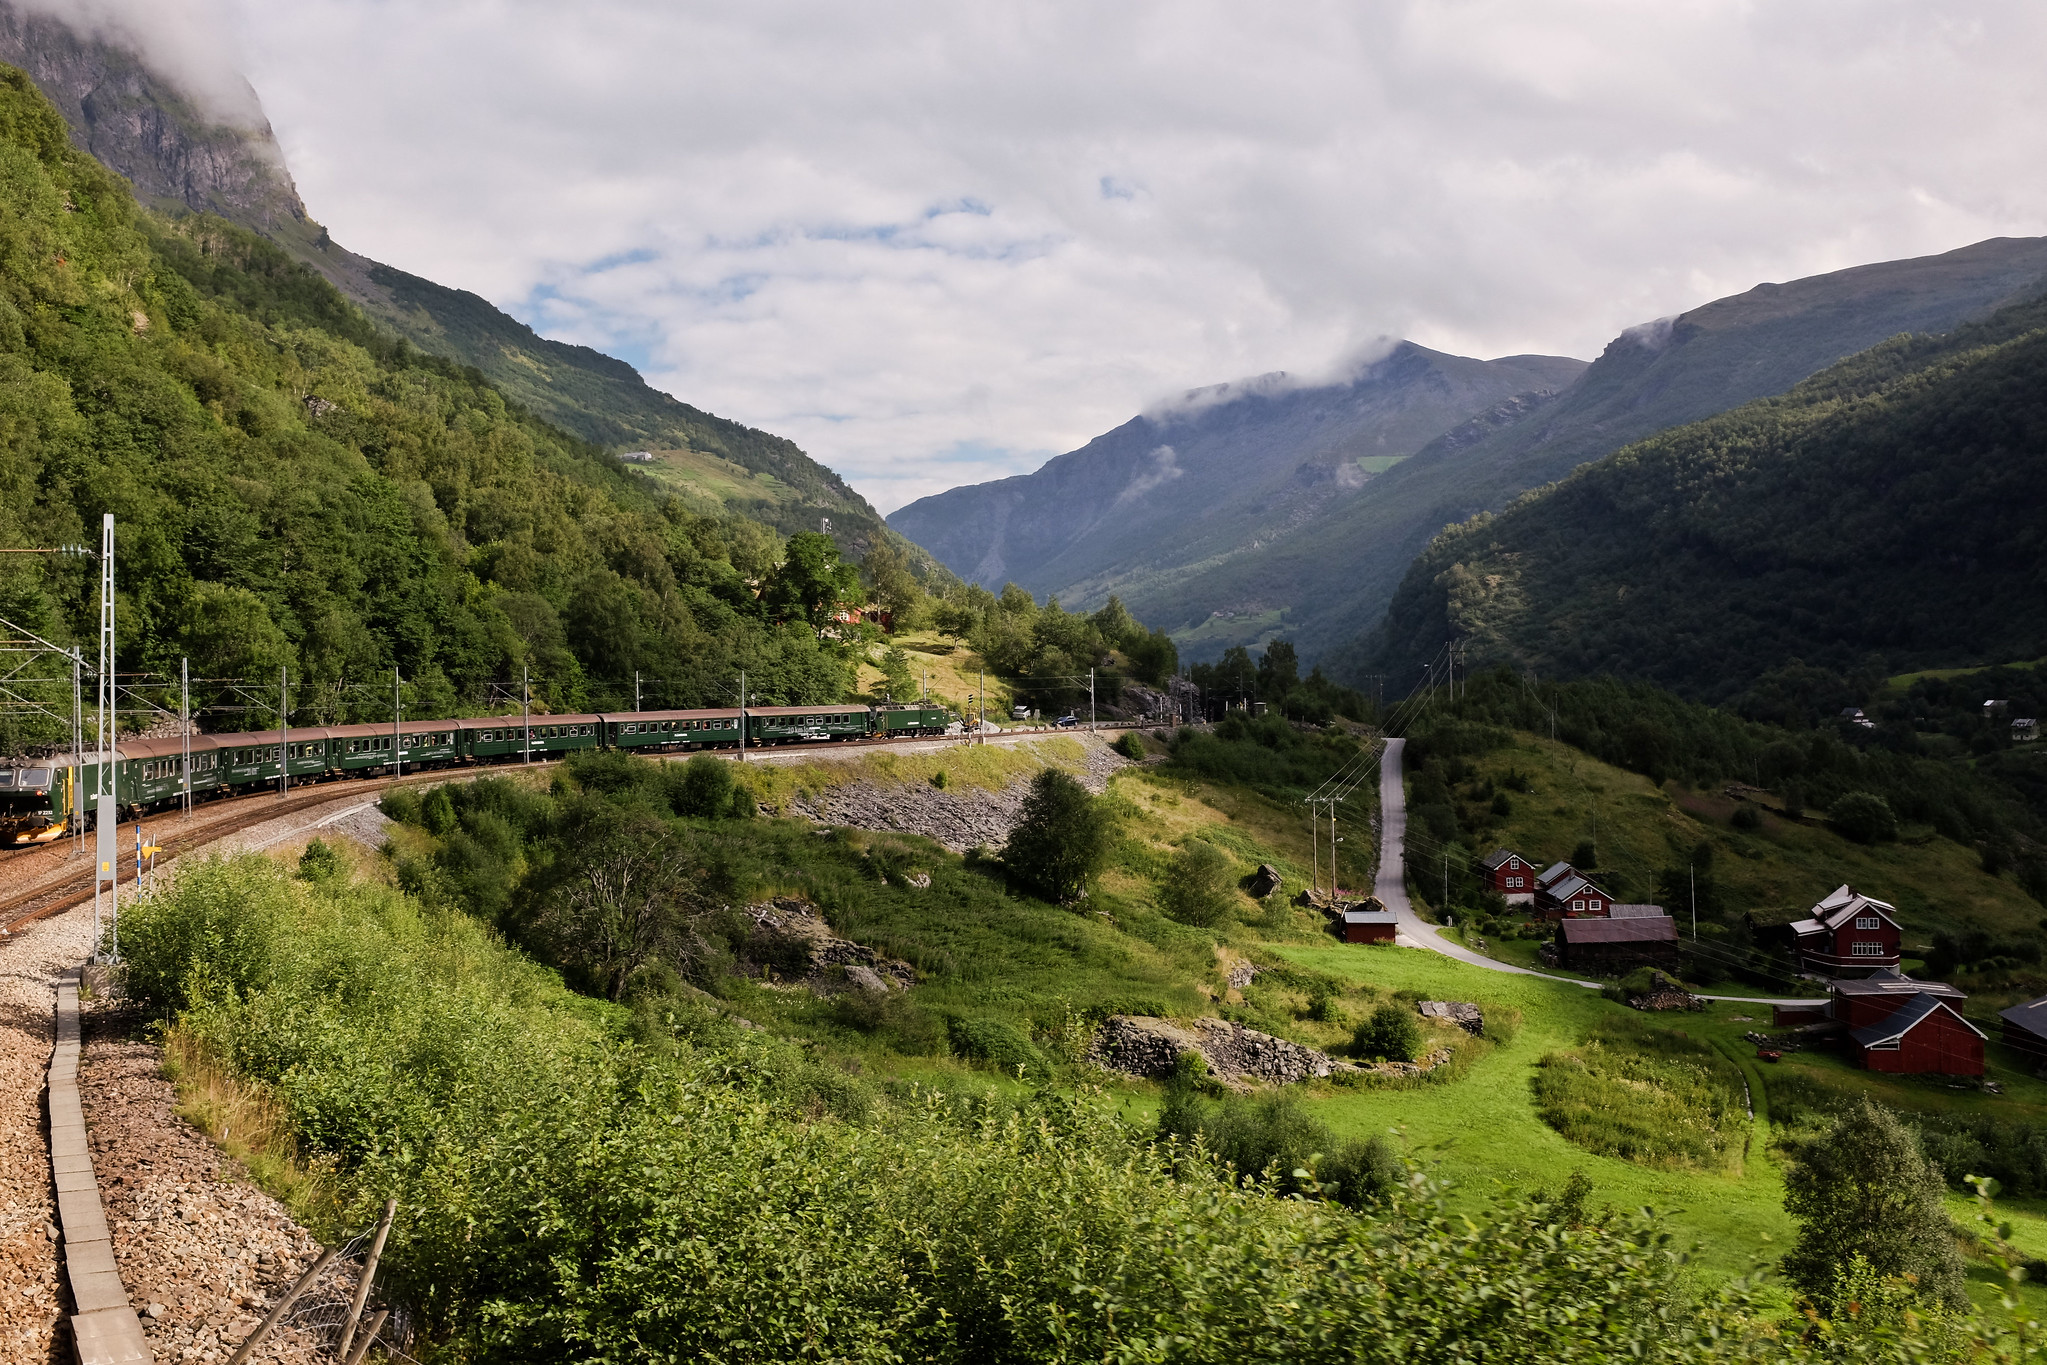 El tren de Flam o Flamsbana camino de la localidad de Myrdal.